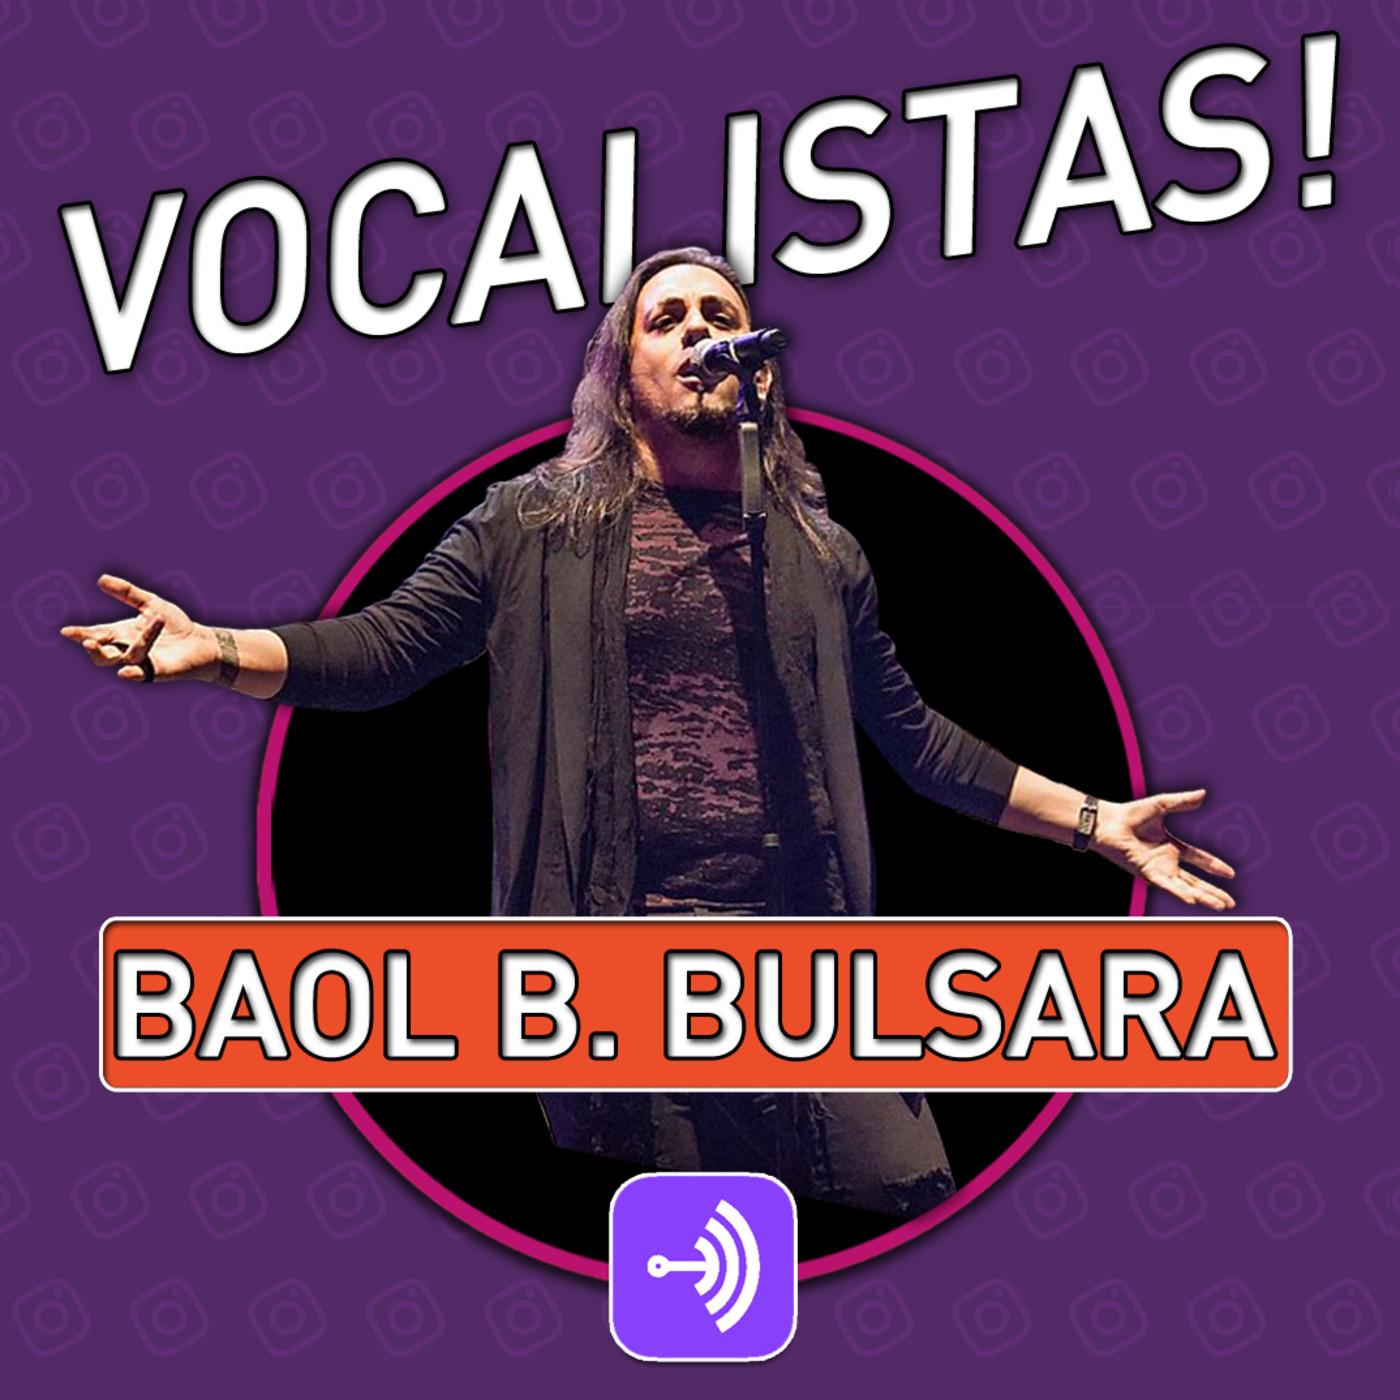 Vocalistas! Baol Bardot Bulsara